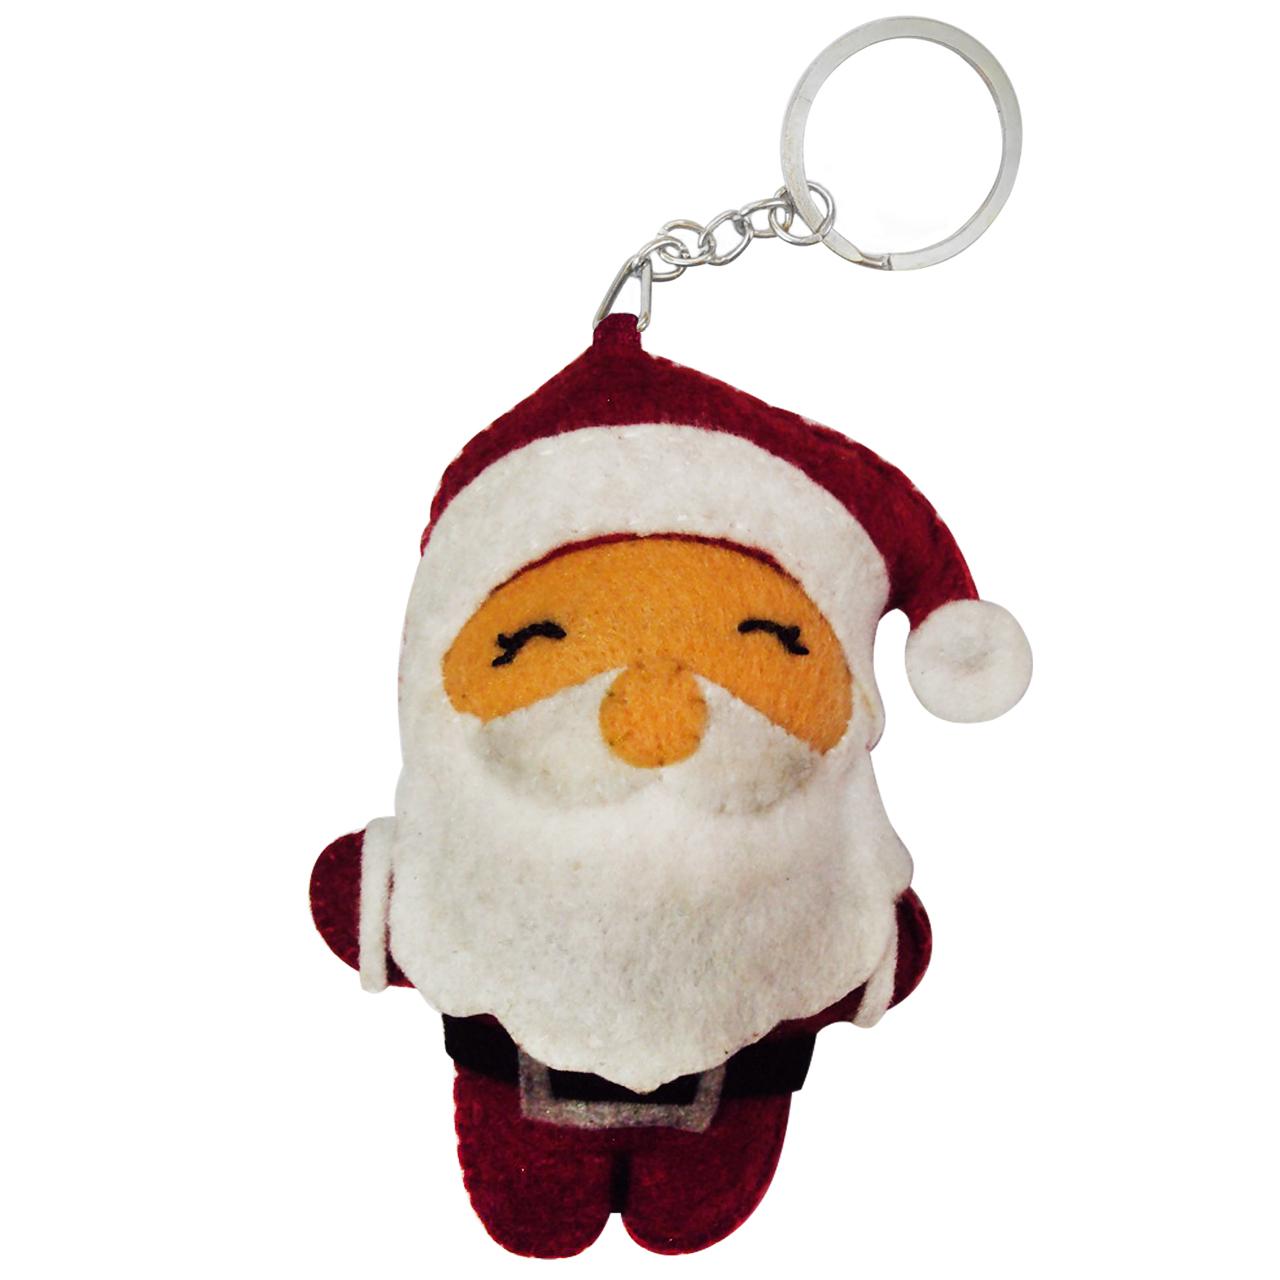 جا کلیدی بابا نوئل کد 0036